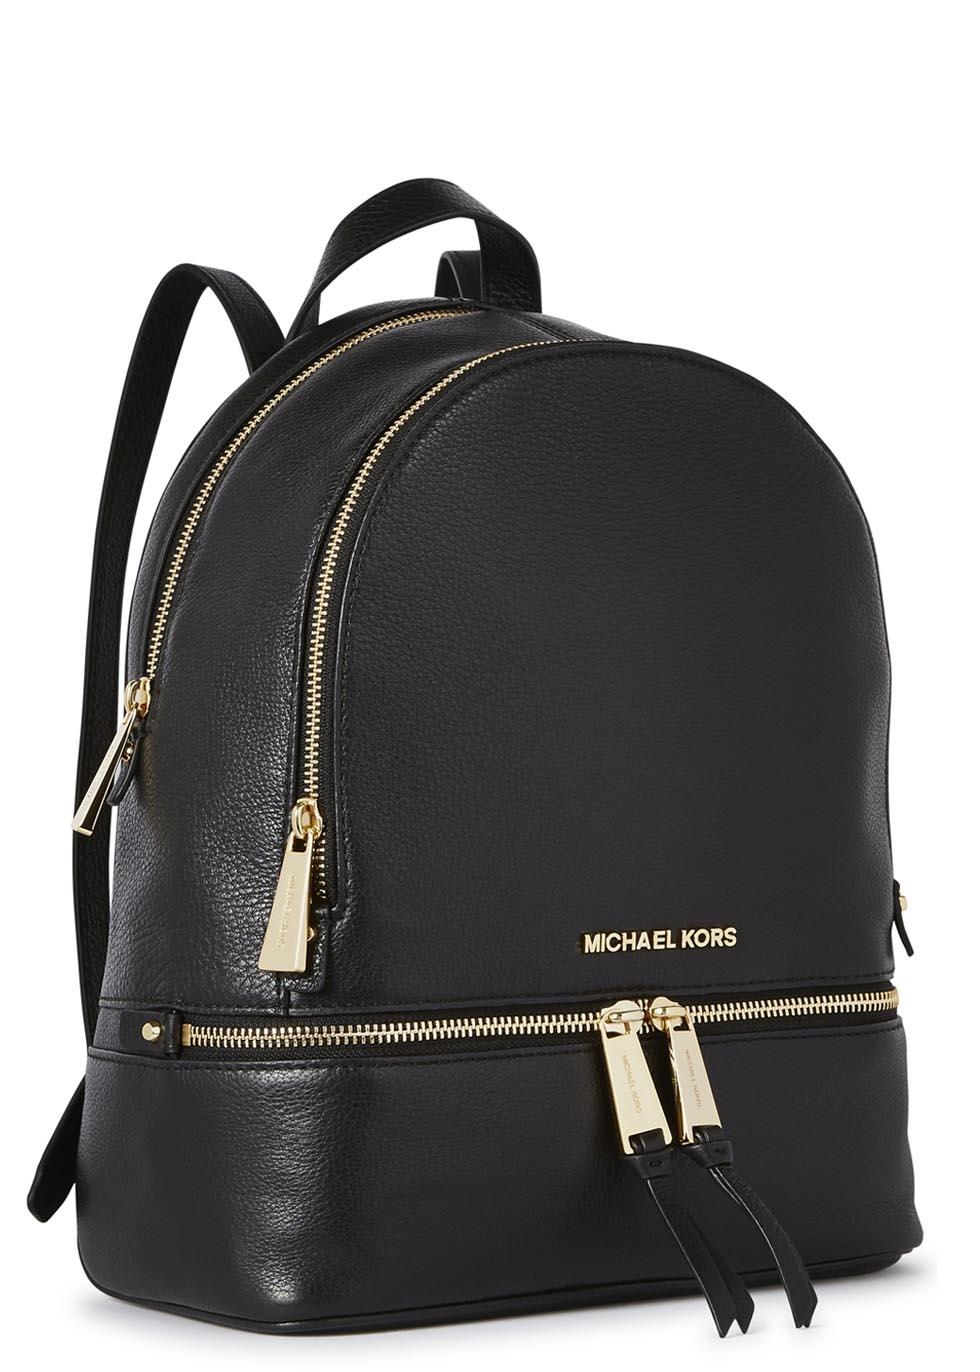 Lyst - Michael kors Rhea Small Black Leather Backpack in Black